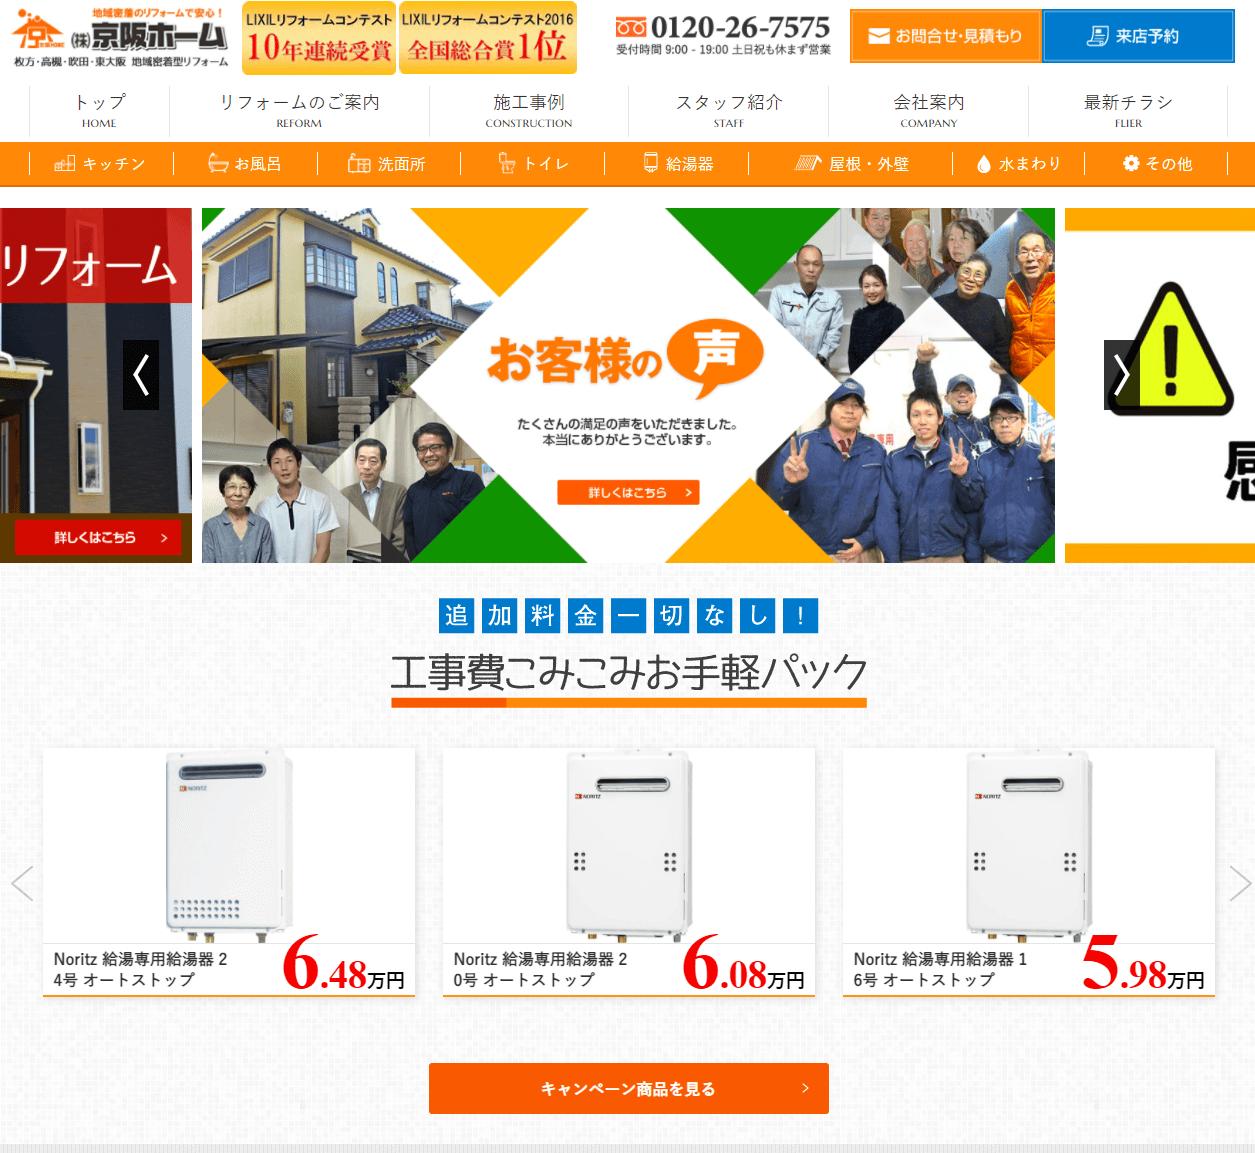 "<span class=""title"">京阪ホームの口コミや評判</span>"